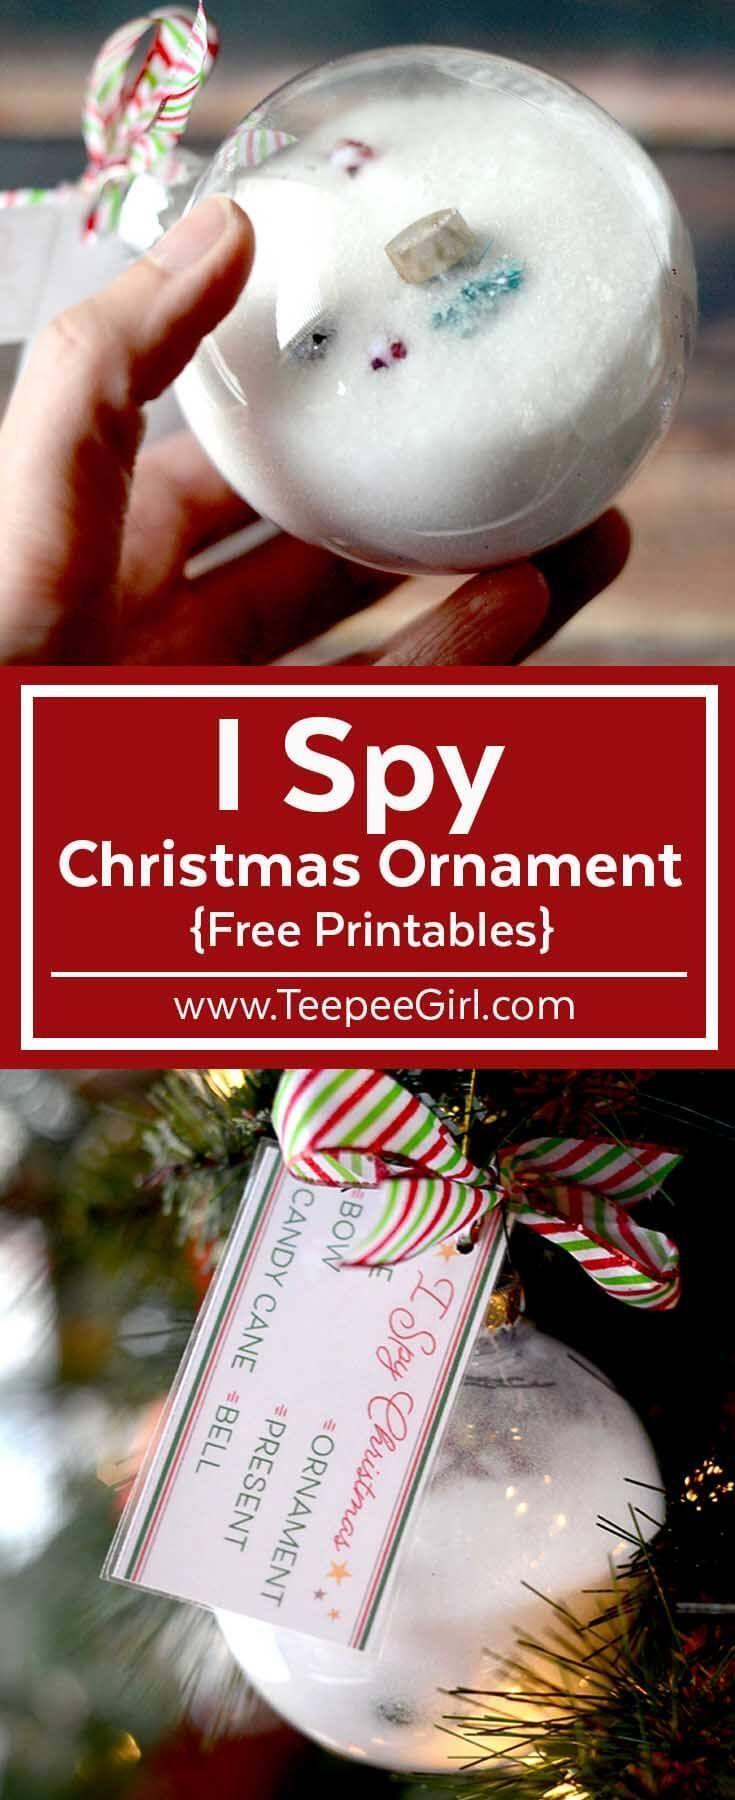 I Spy Christmas Ornament/Christmas Gift & Craft Idea! | Christmas ...